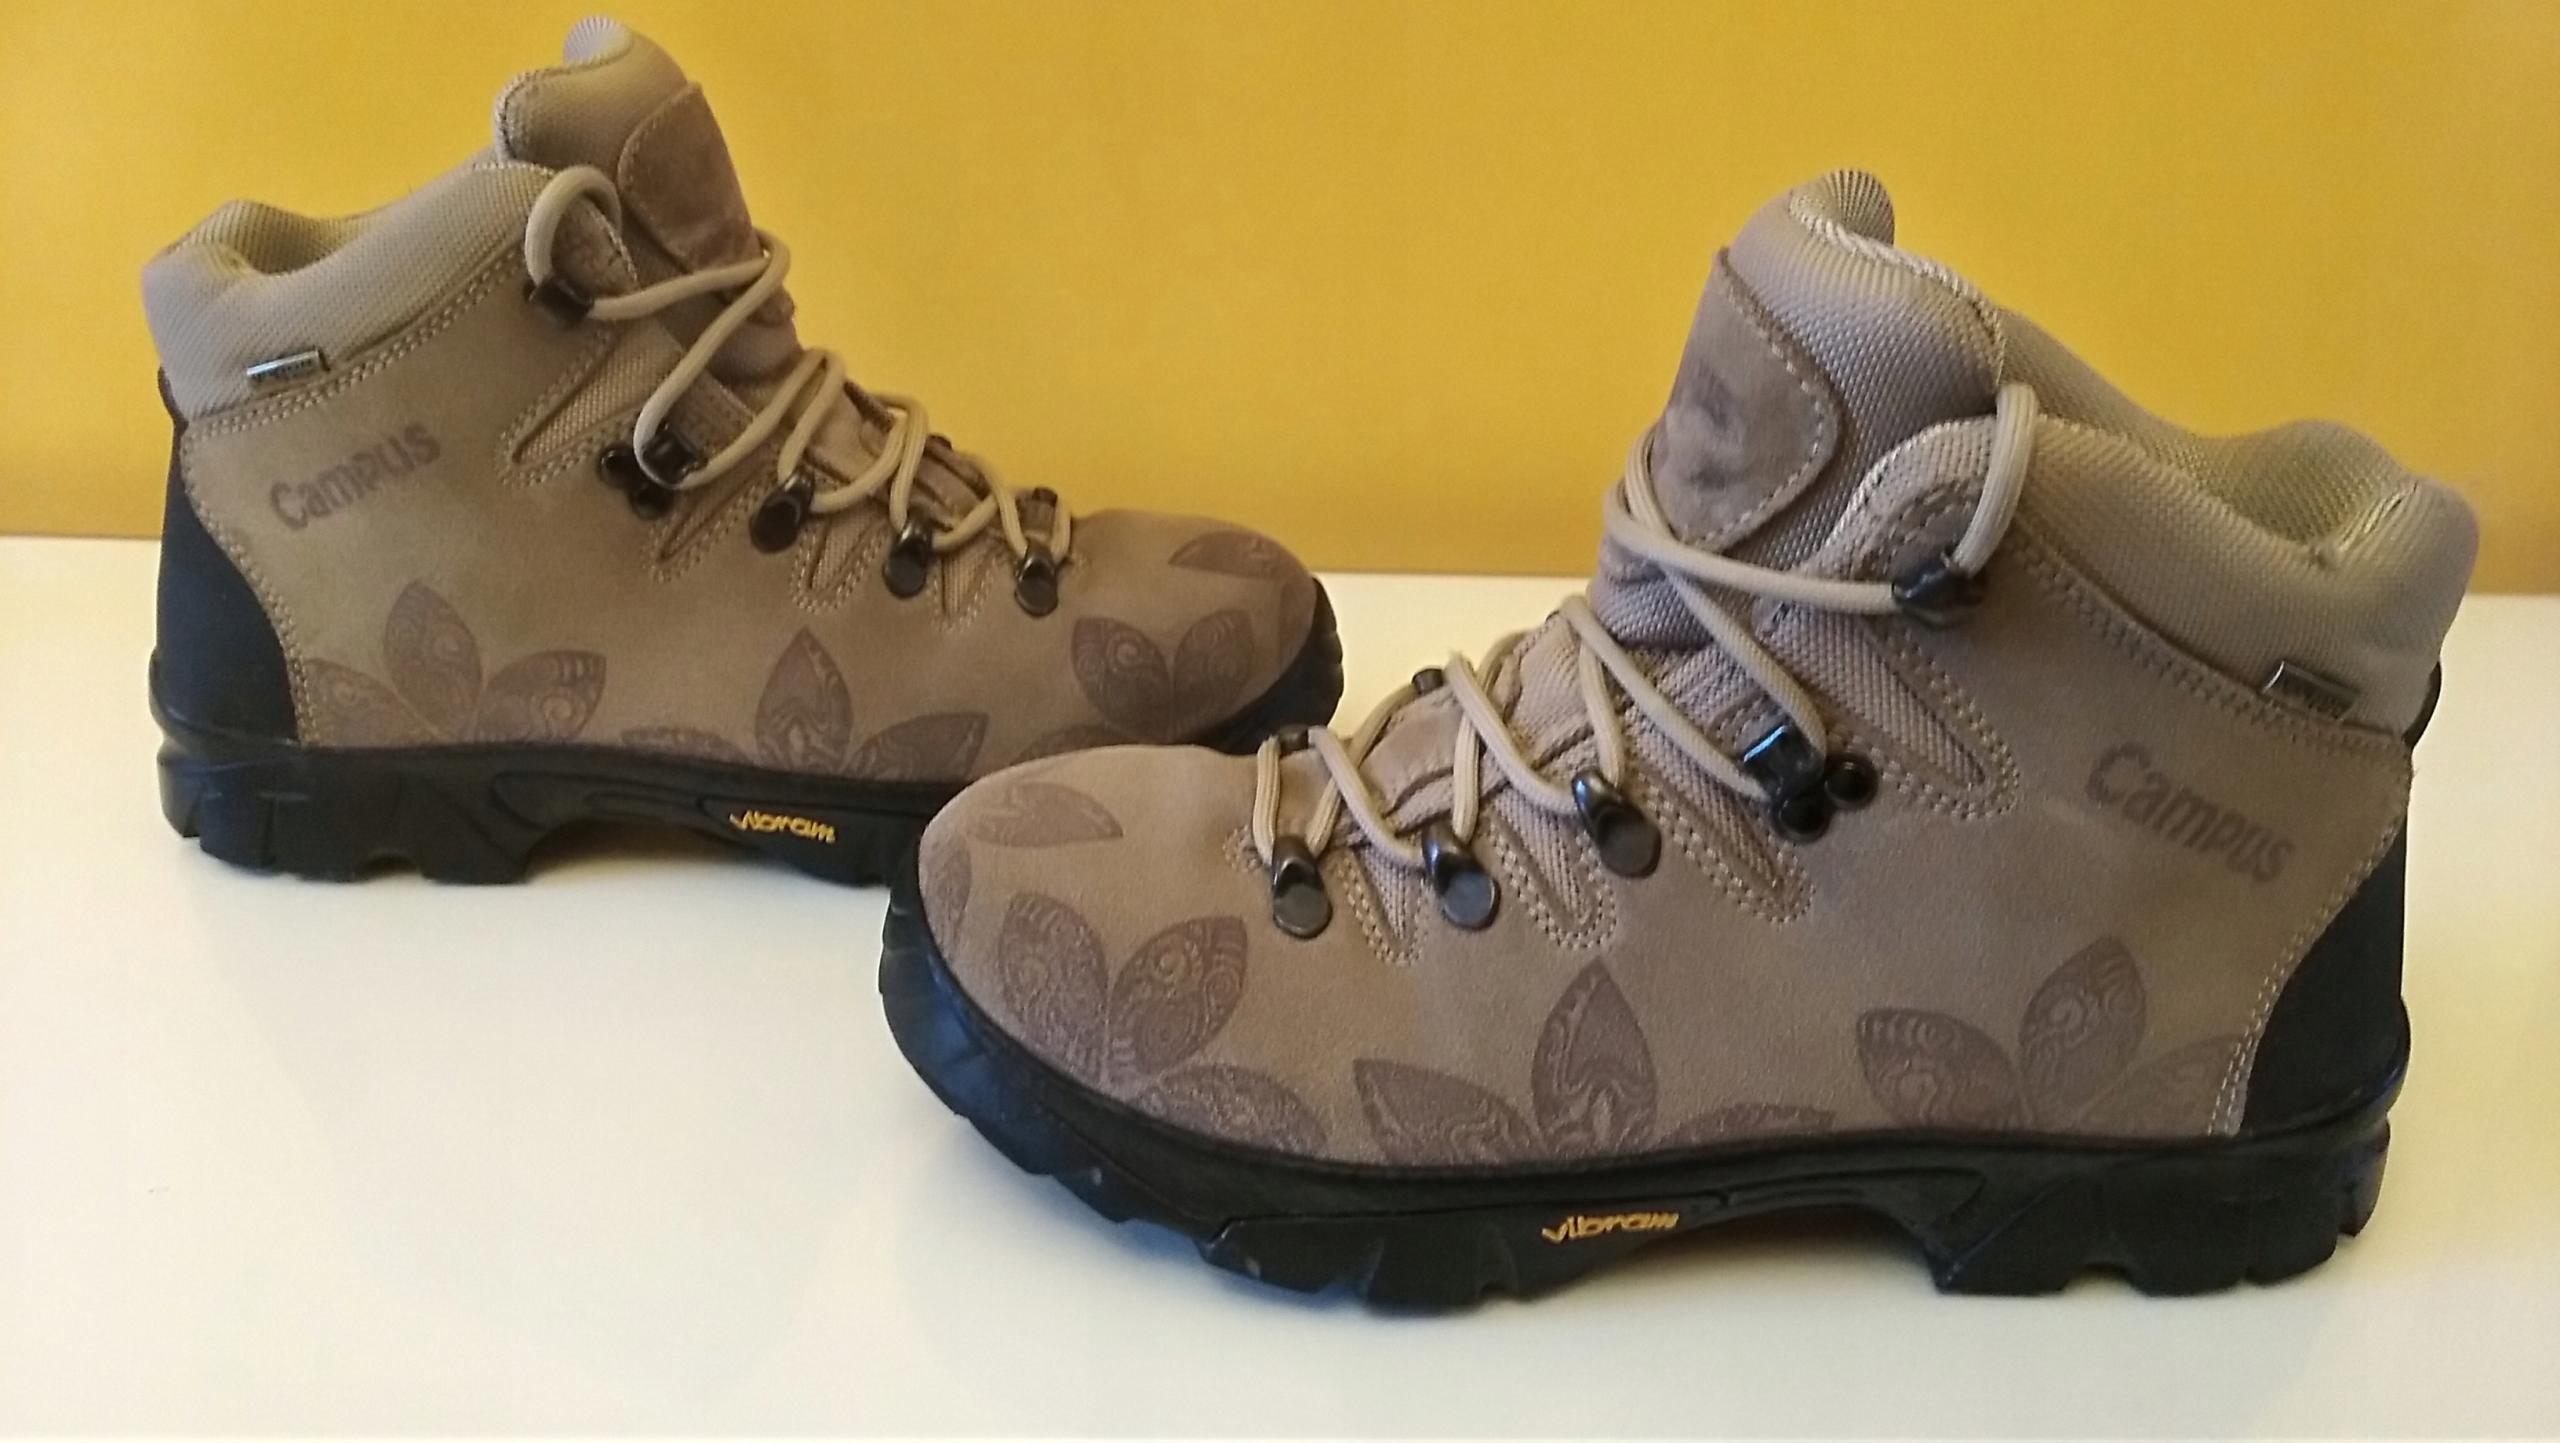 09d07647 CAMPUS vibram vaportex buty trekkingowe damskie 38 - 7670846981 ...